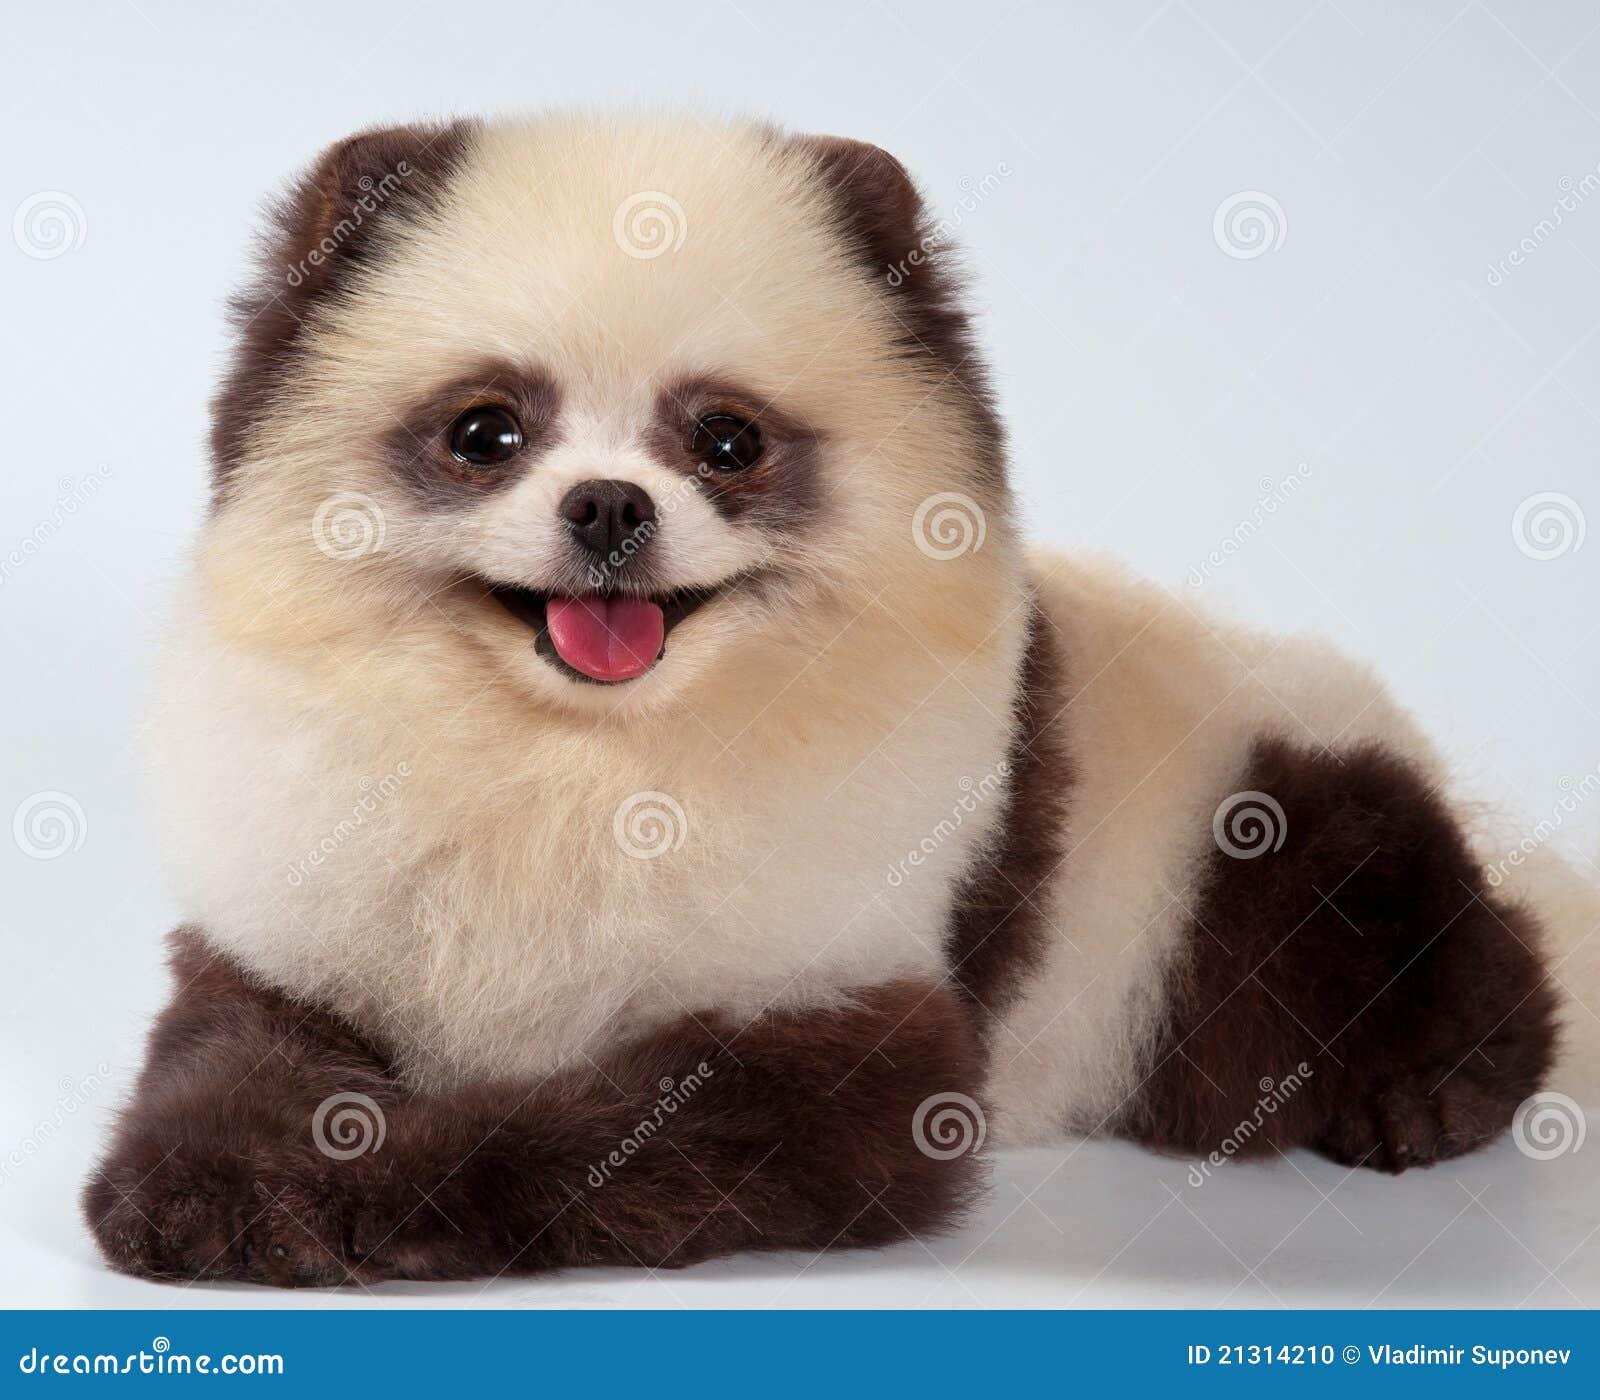 Panda  Definition of Panda by MerriamWebster